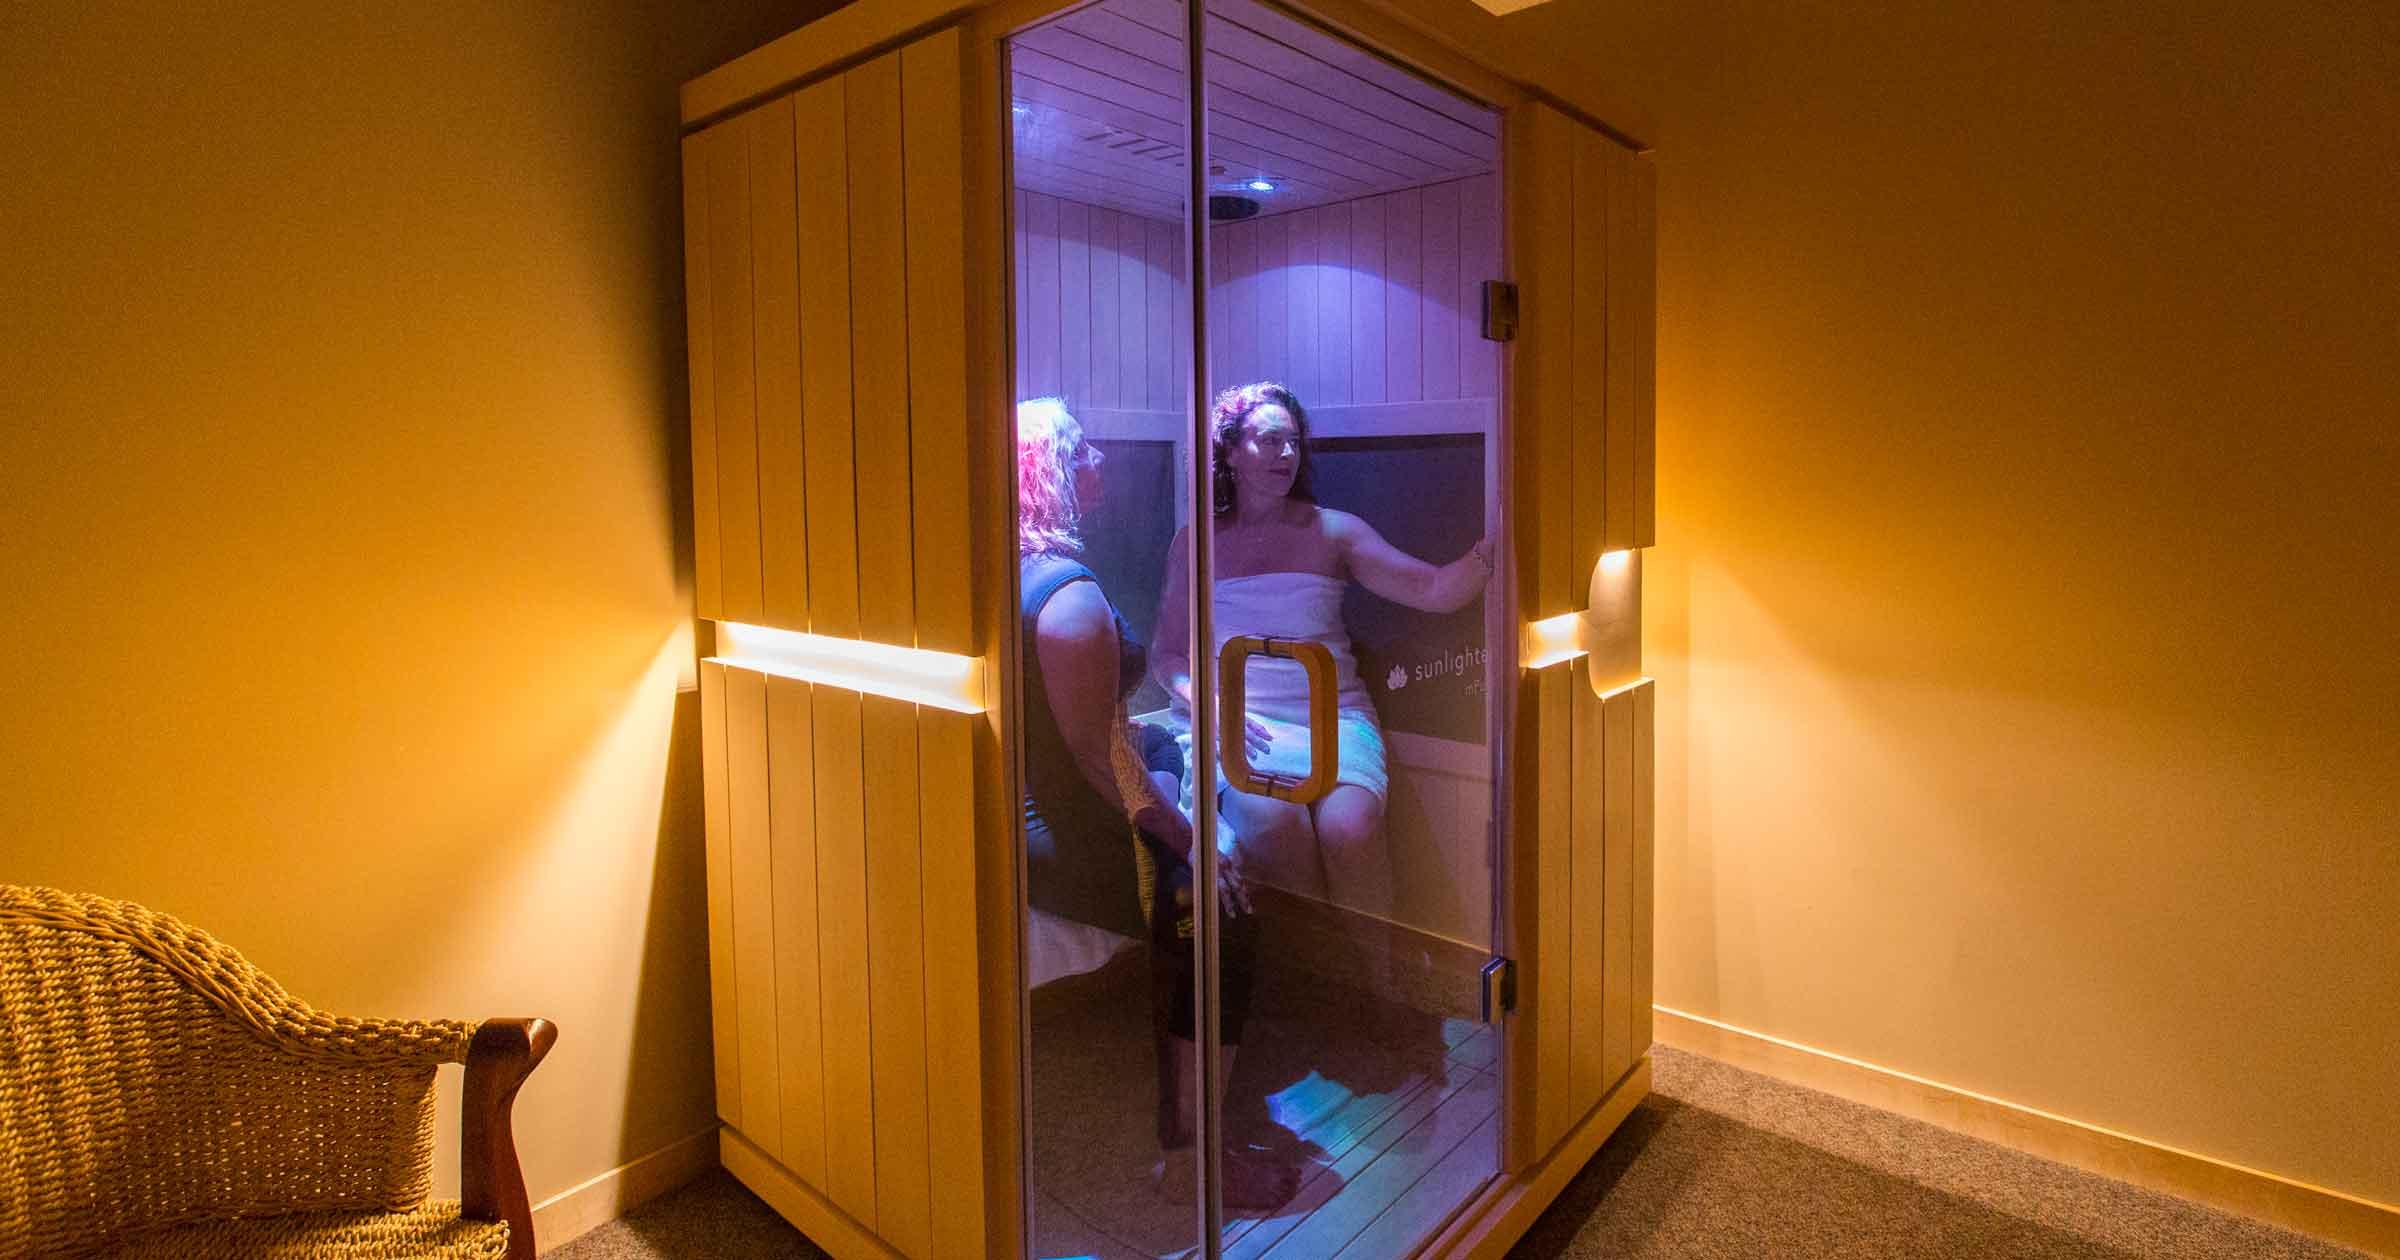 Unprotected at the sauna